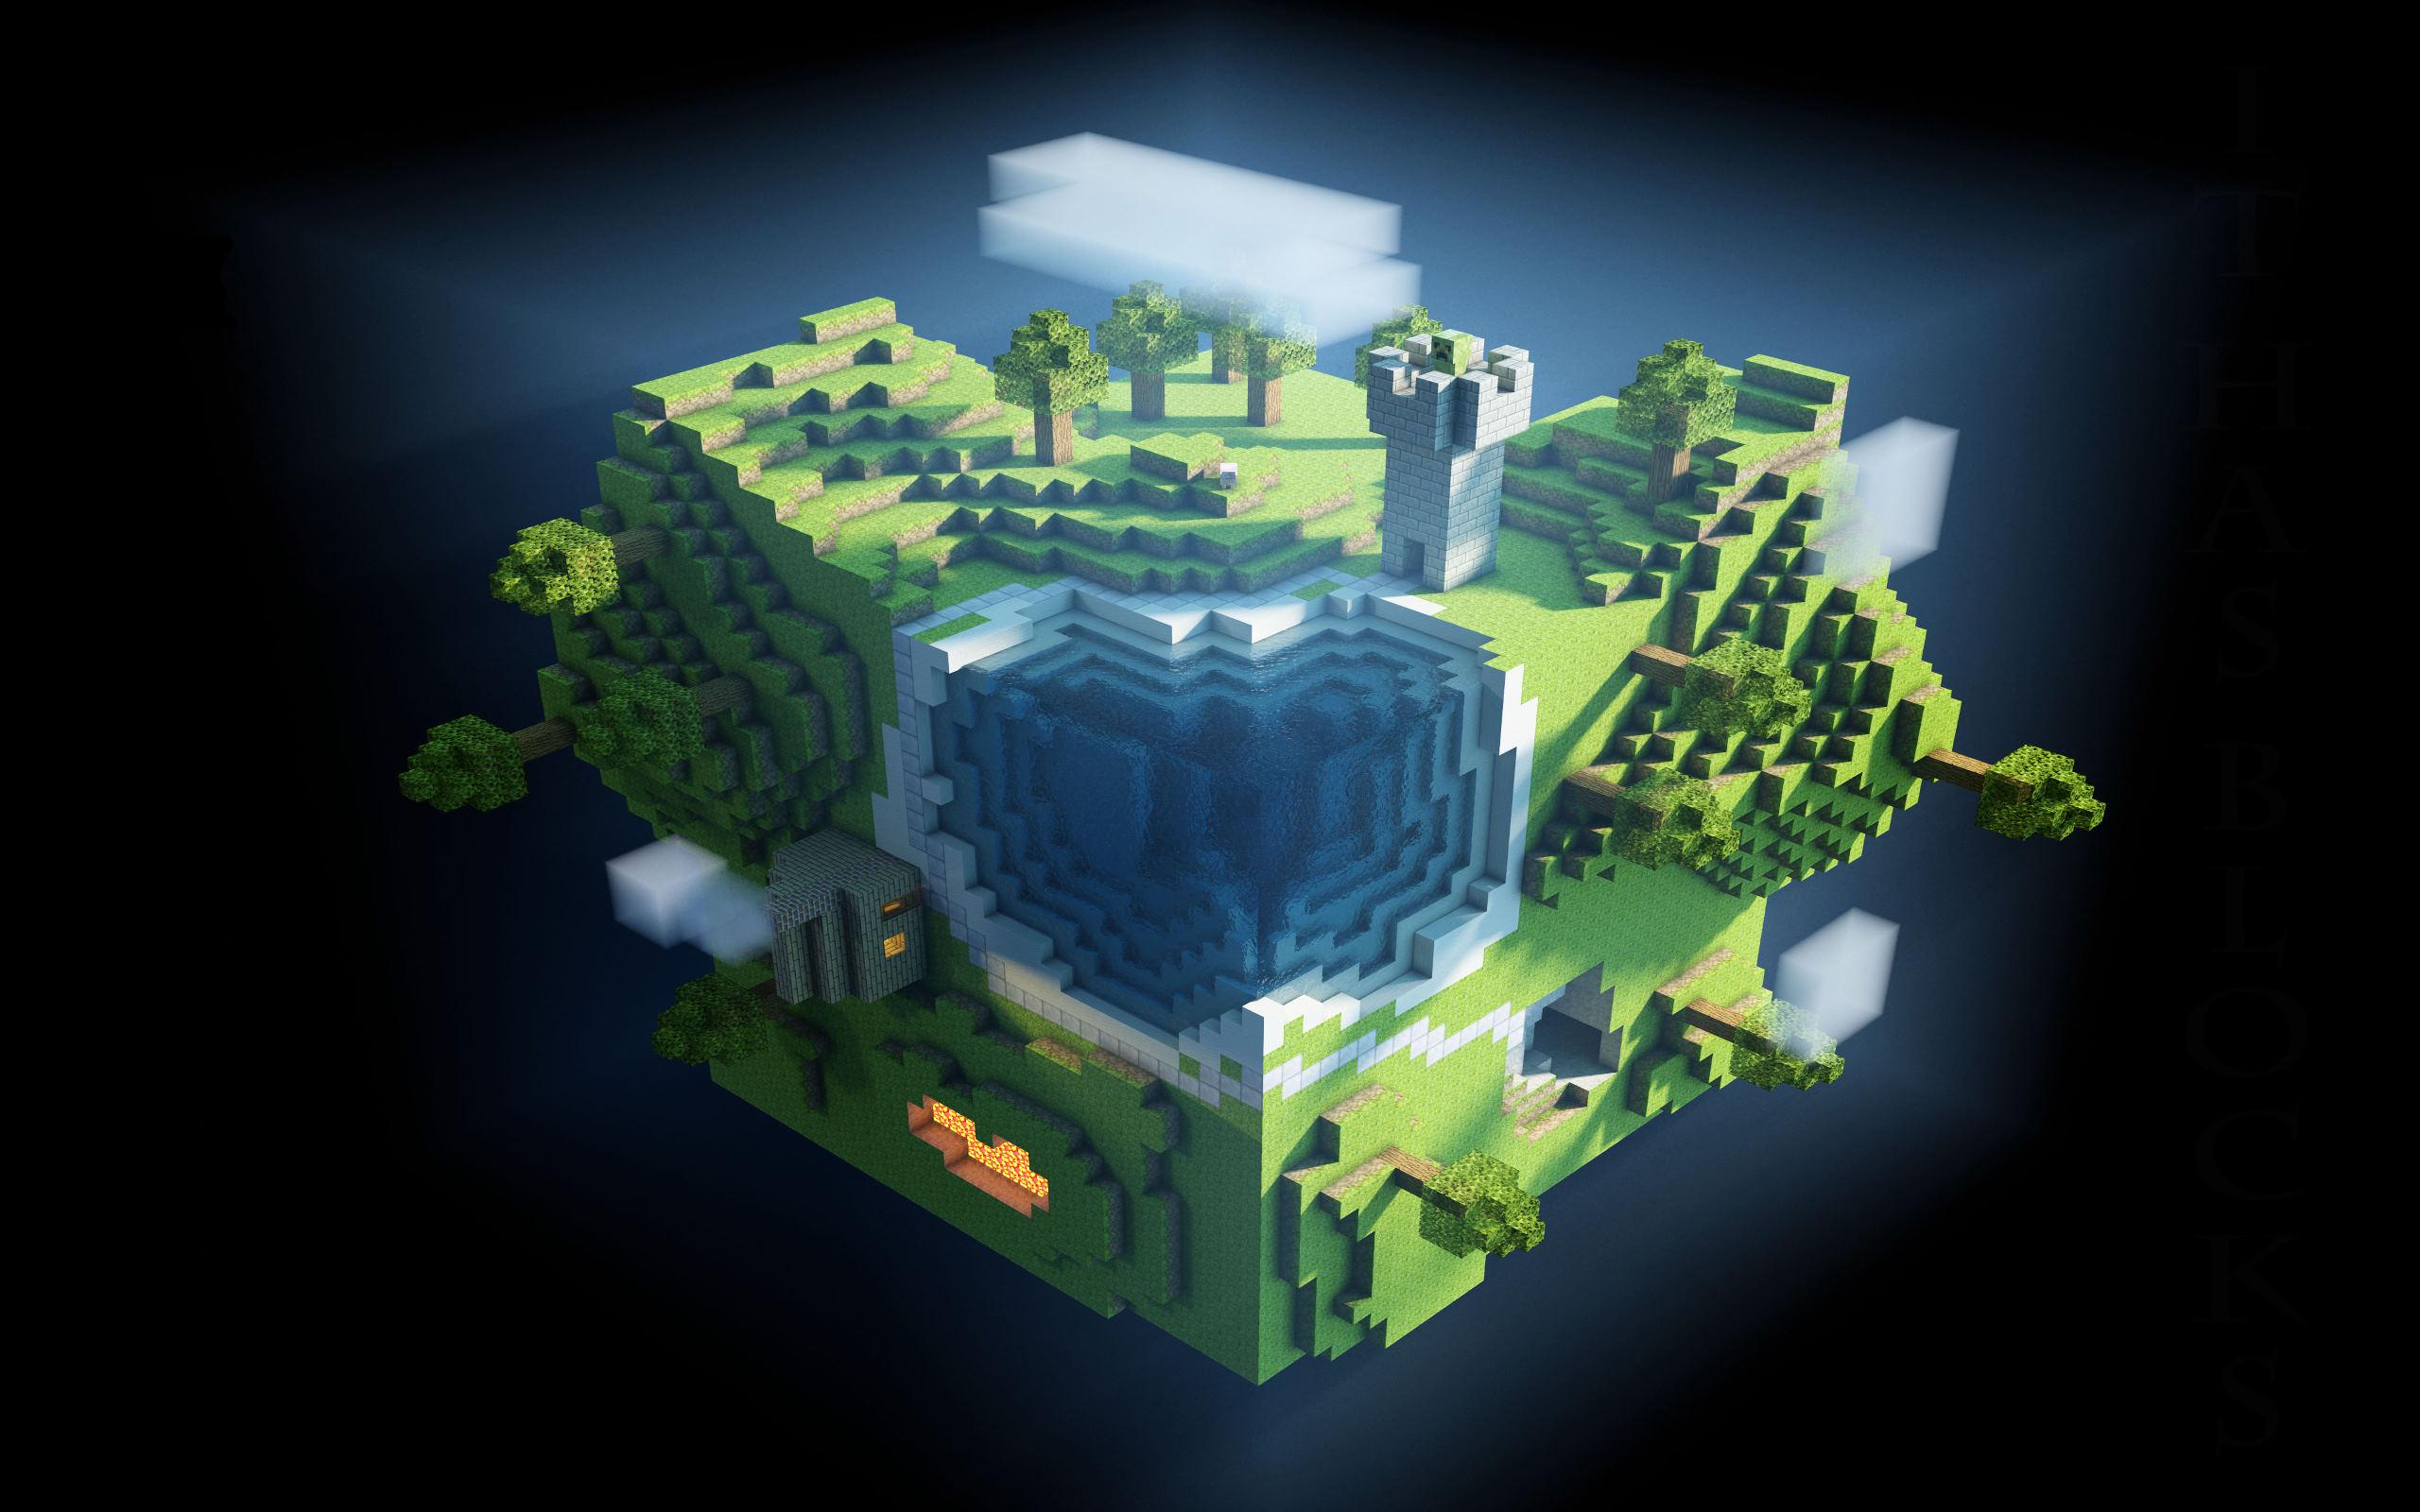 2560x1600 Minecraft desktop PC and Mac wallpaper more 2560x1600